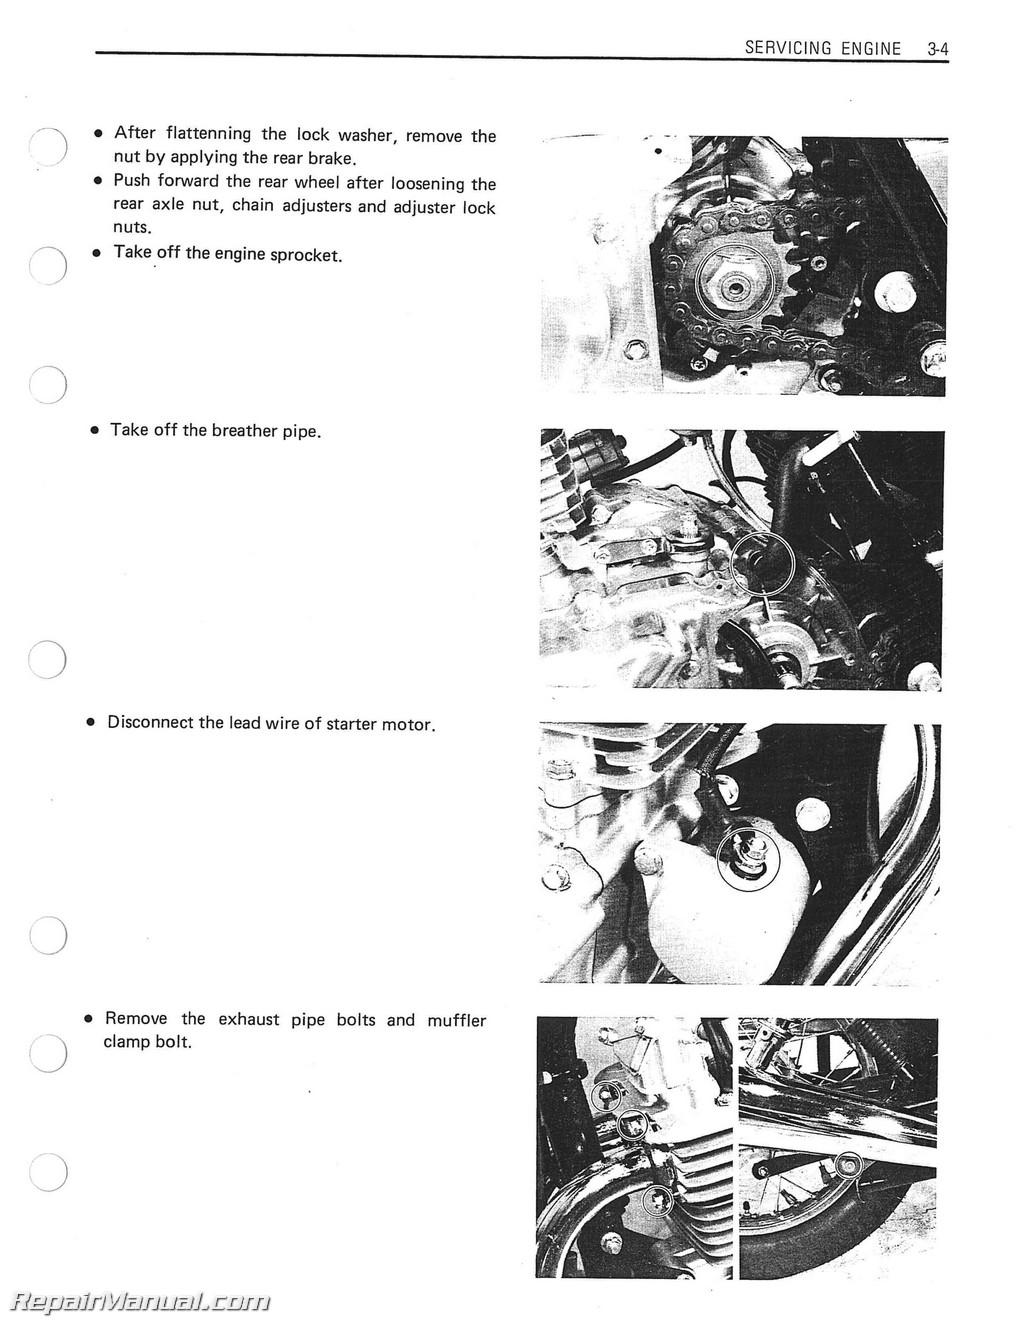 suzuki boulevard s40 service manual